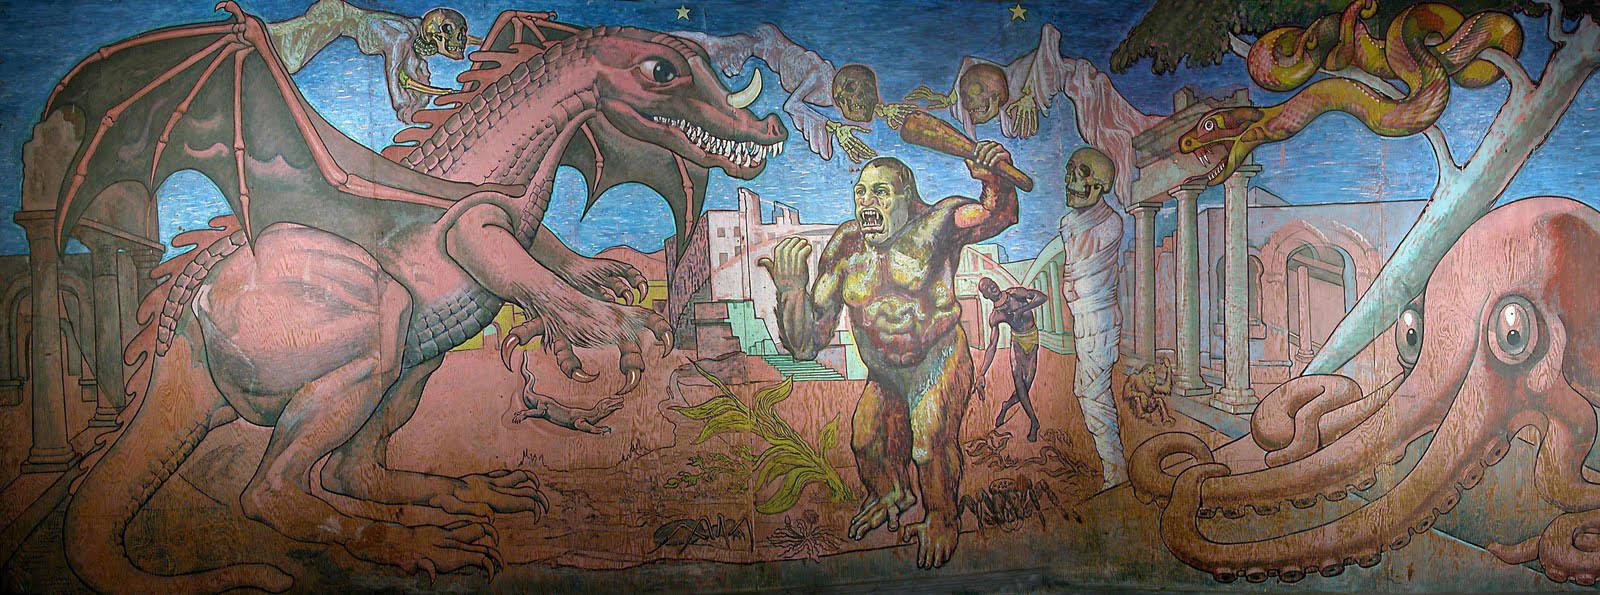 Terroride Mural